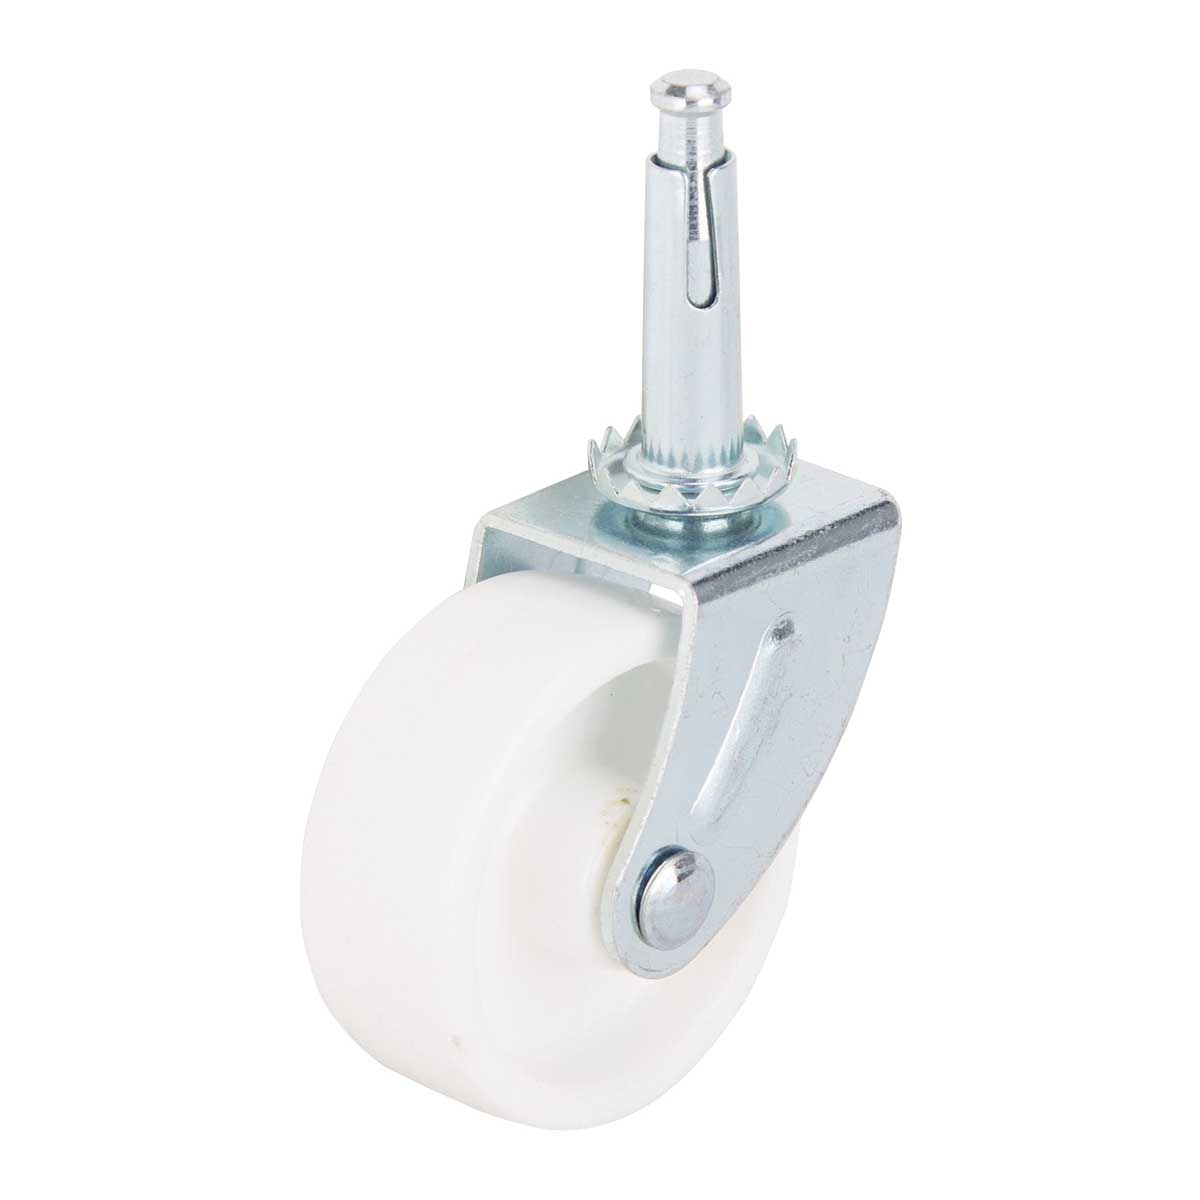 Picture of ProSource JC-B24-PS Swivel Caster, 2 in Dia Wheel, Hard Plastic Wheel, White, 60 lb